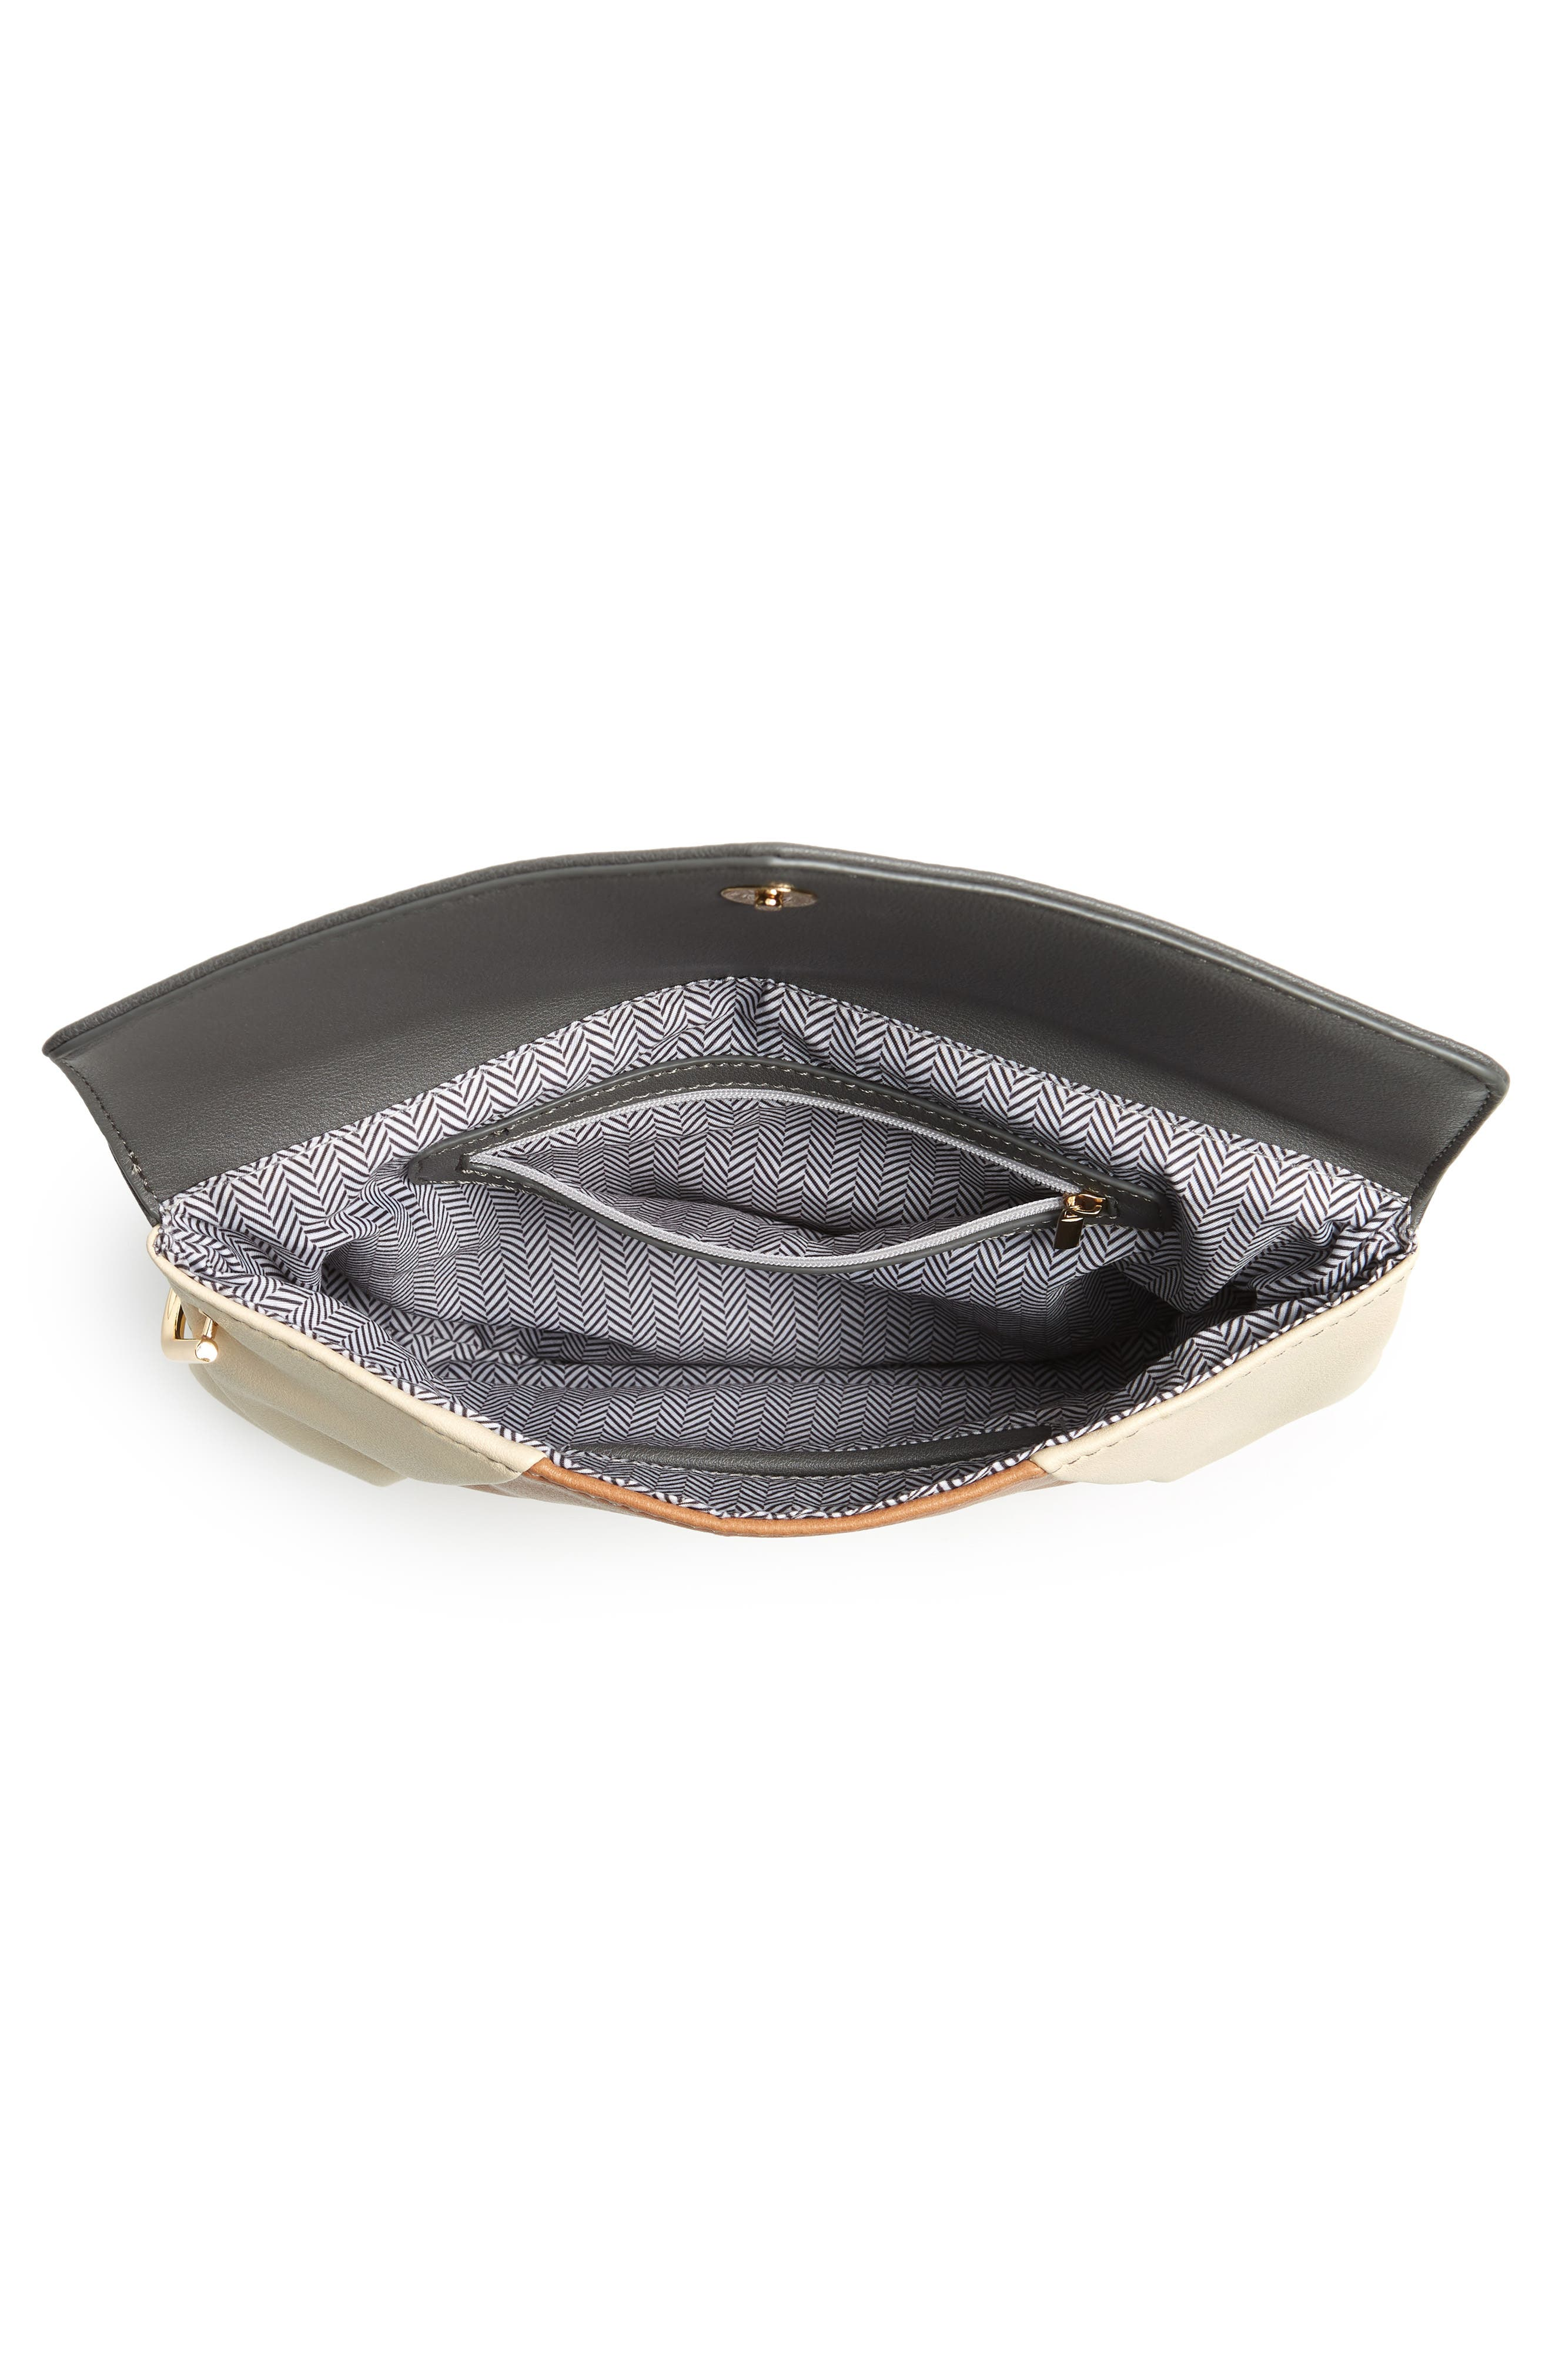 Shea Tricolor Faux Leather Clutch,                             Alternate thumbnail 4, color,                             Grey Multi